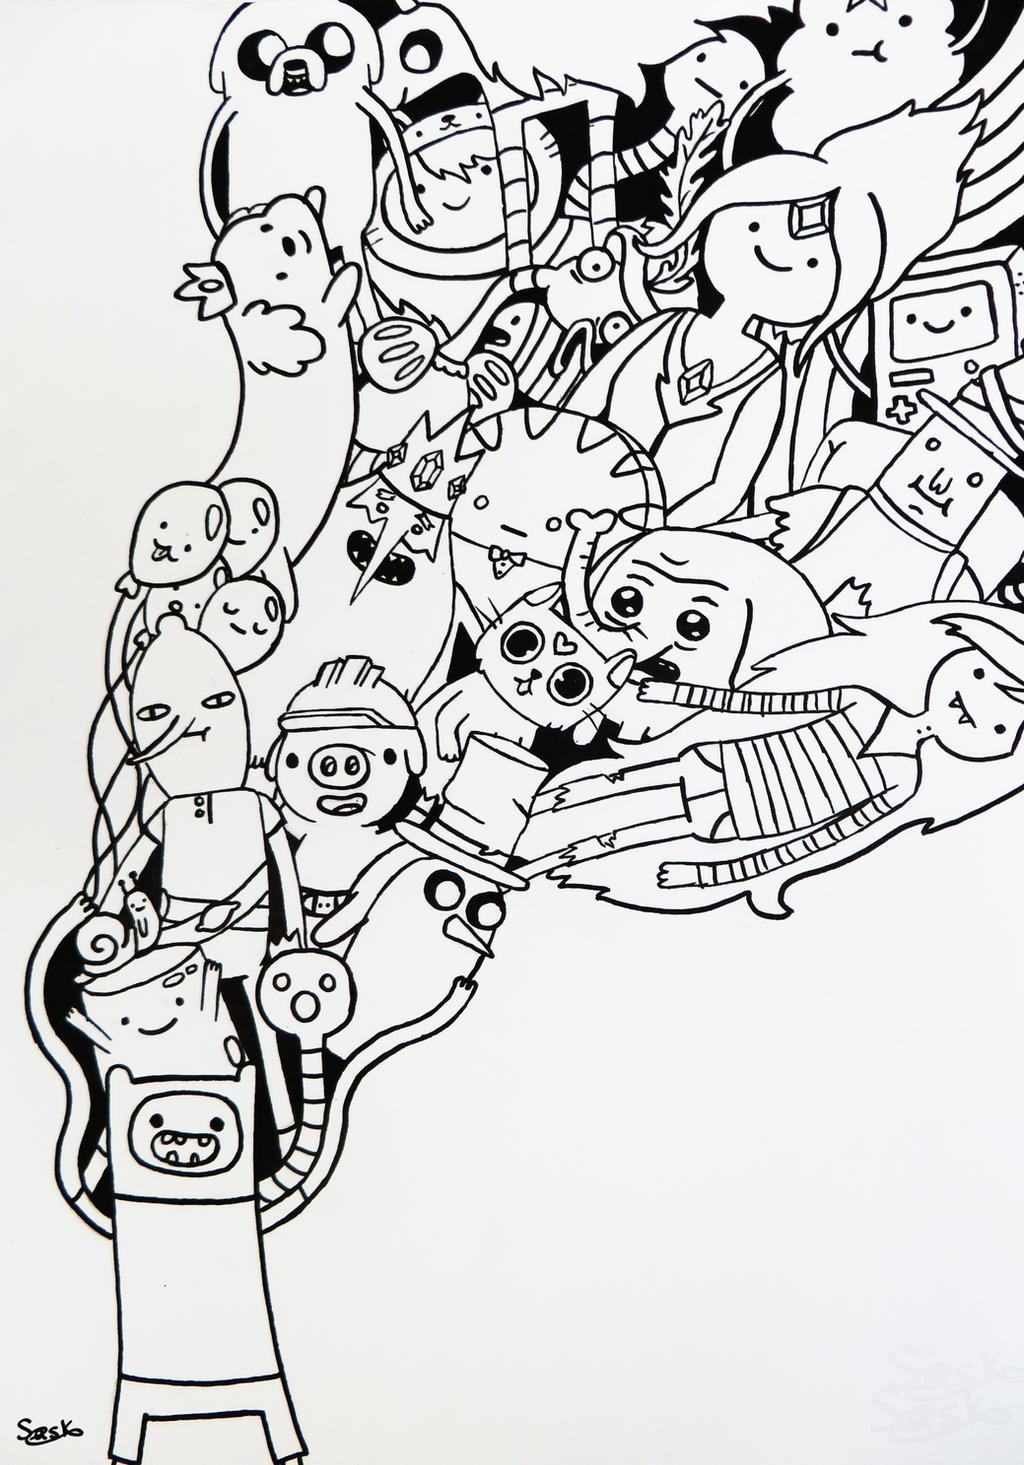 Adventure time doodle by Zilverlovely on DeviantArt